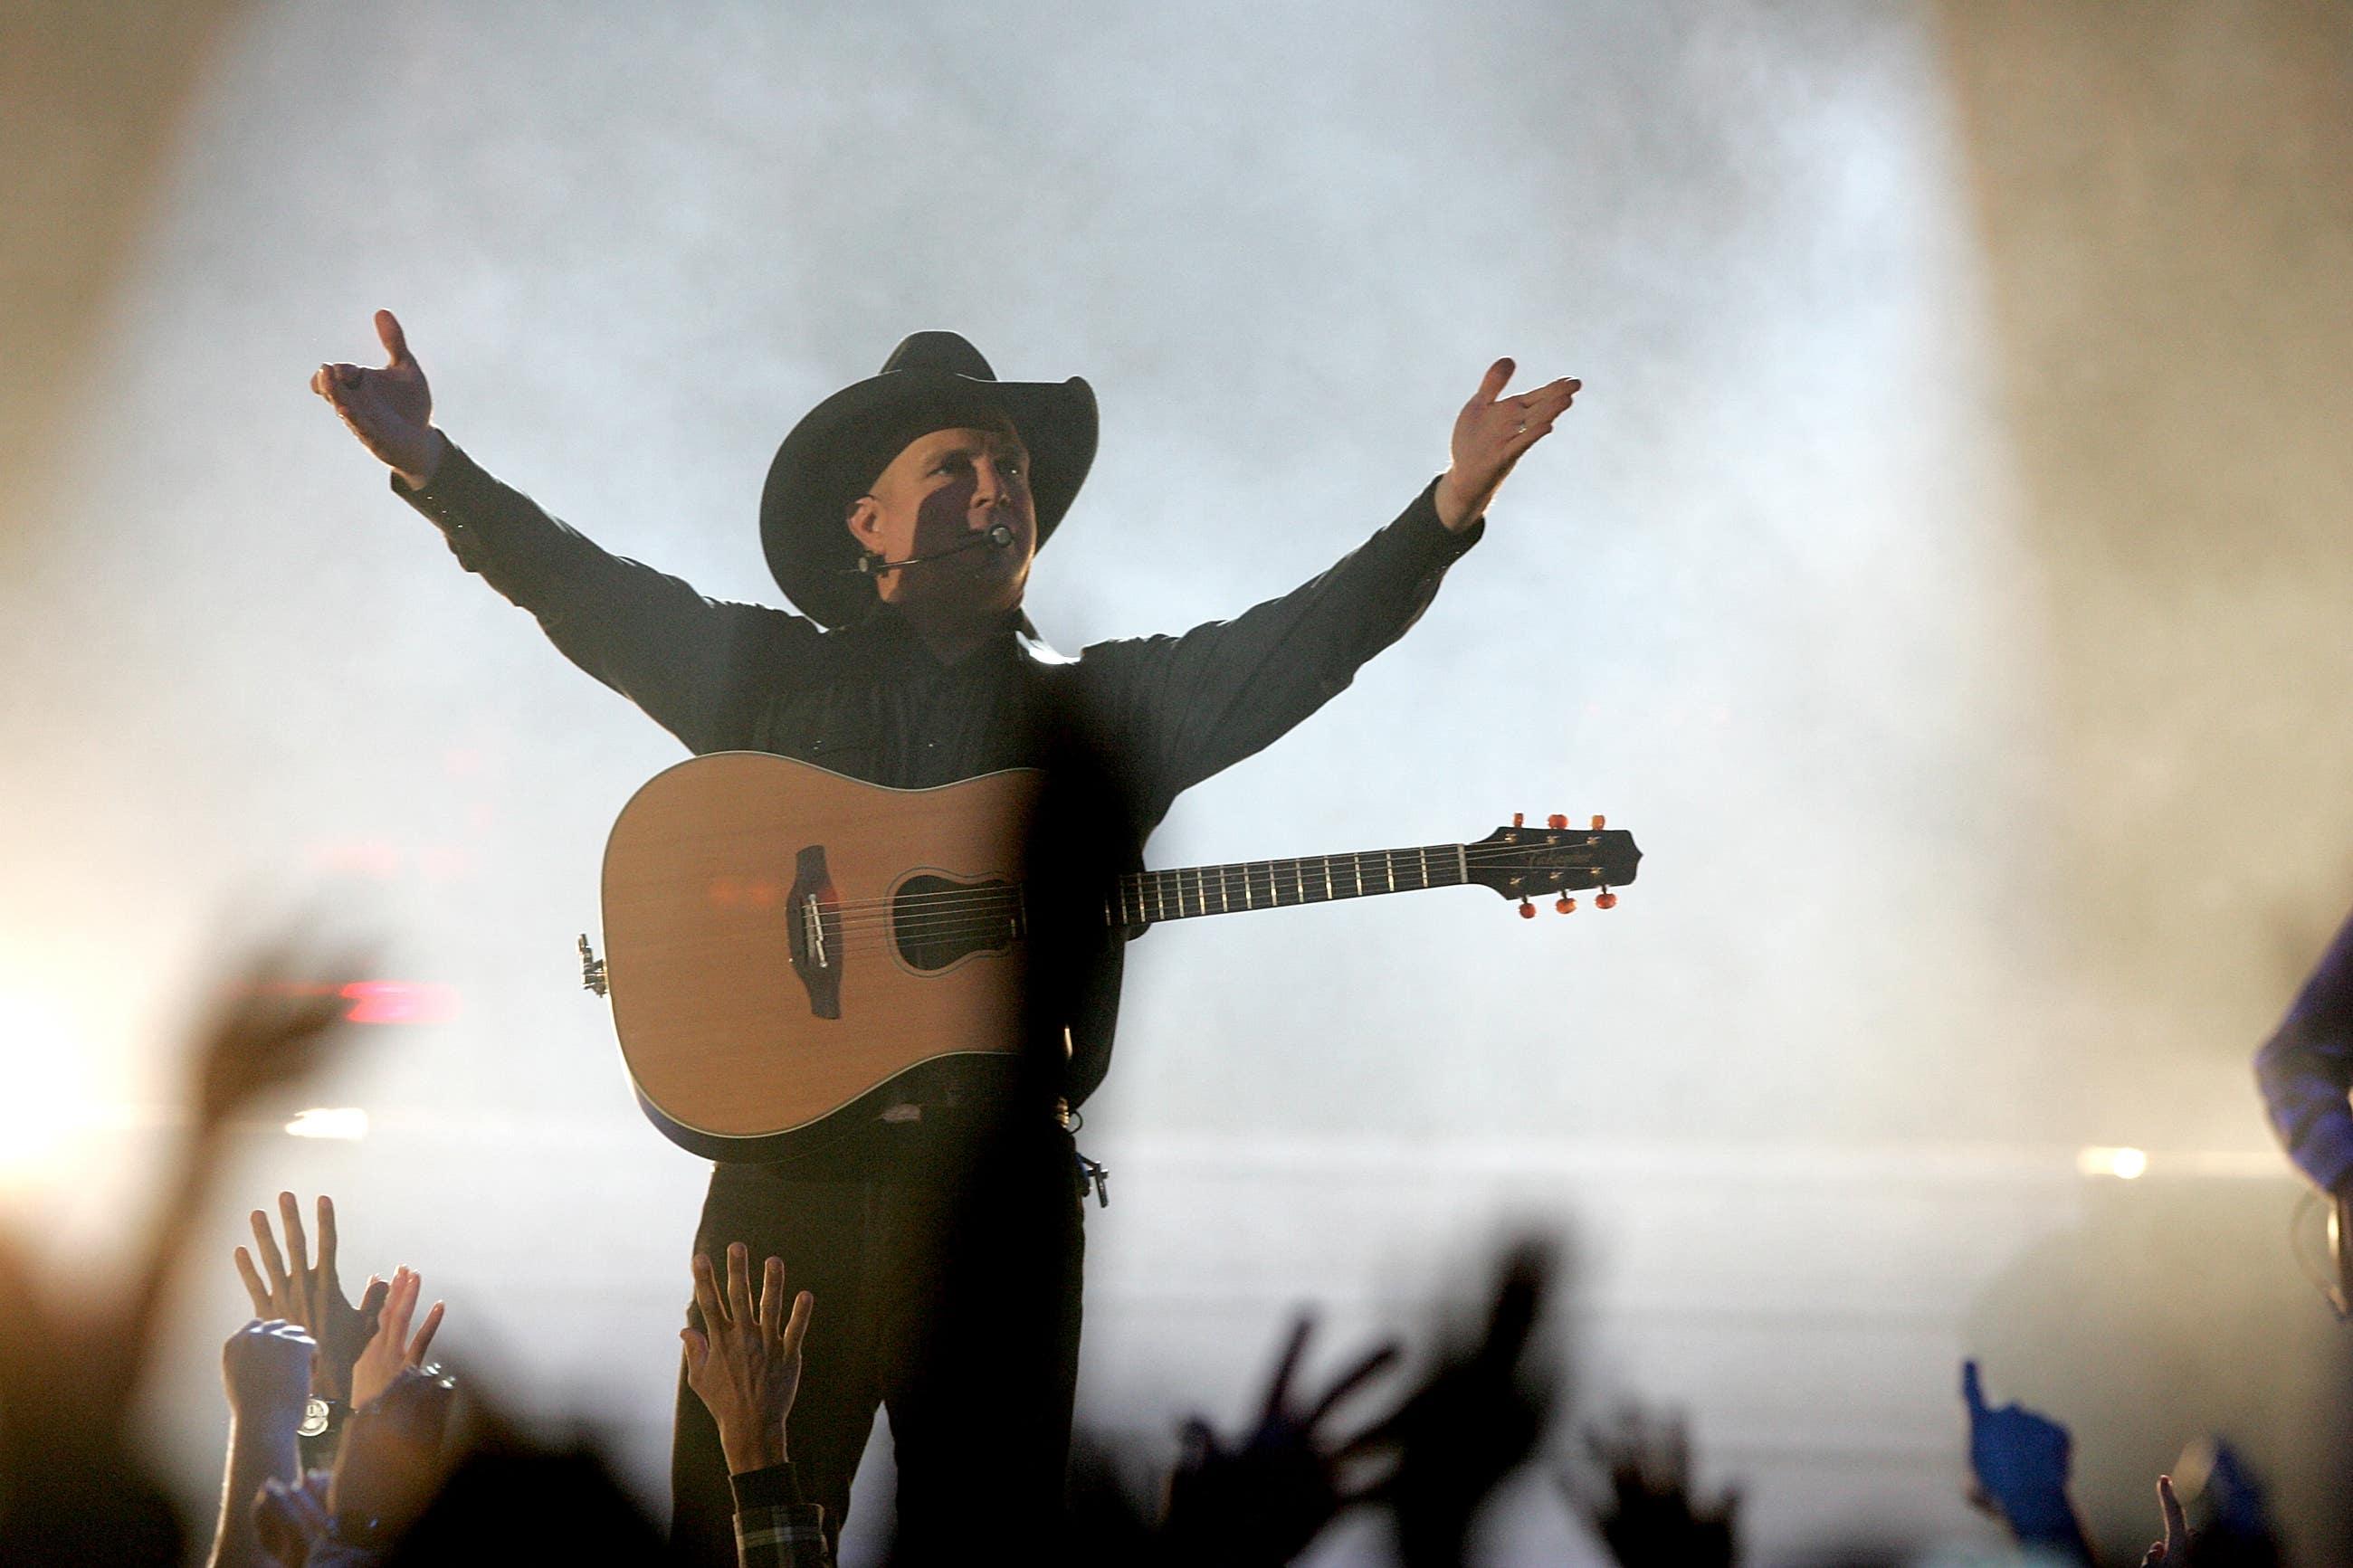 Garth Brooks on stage at STAPLES Center